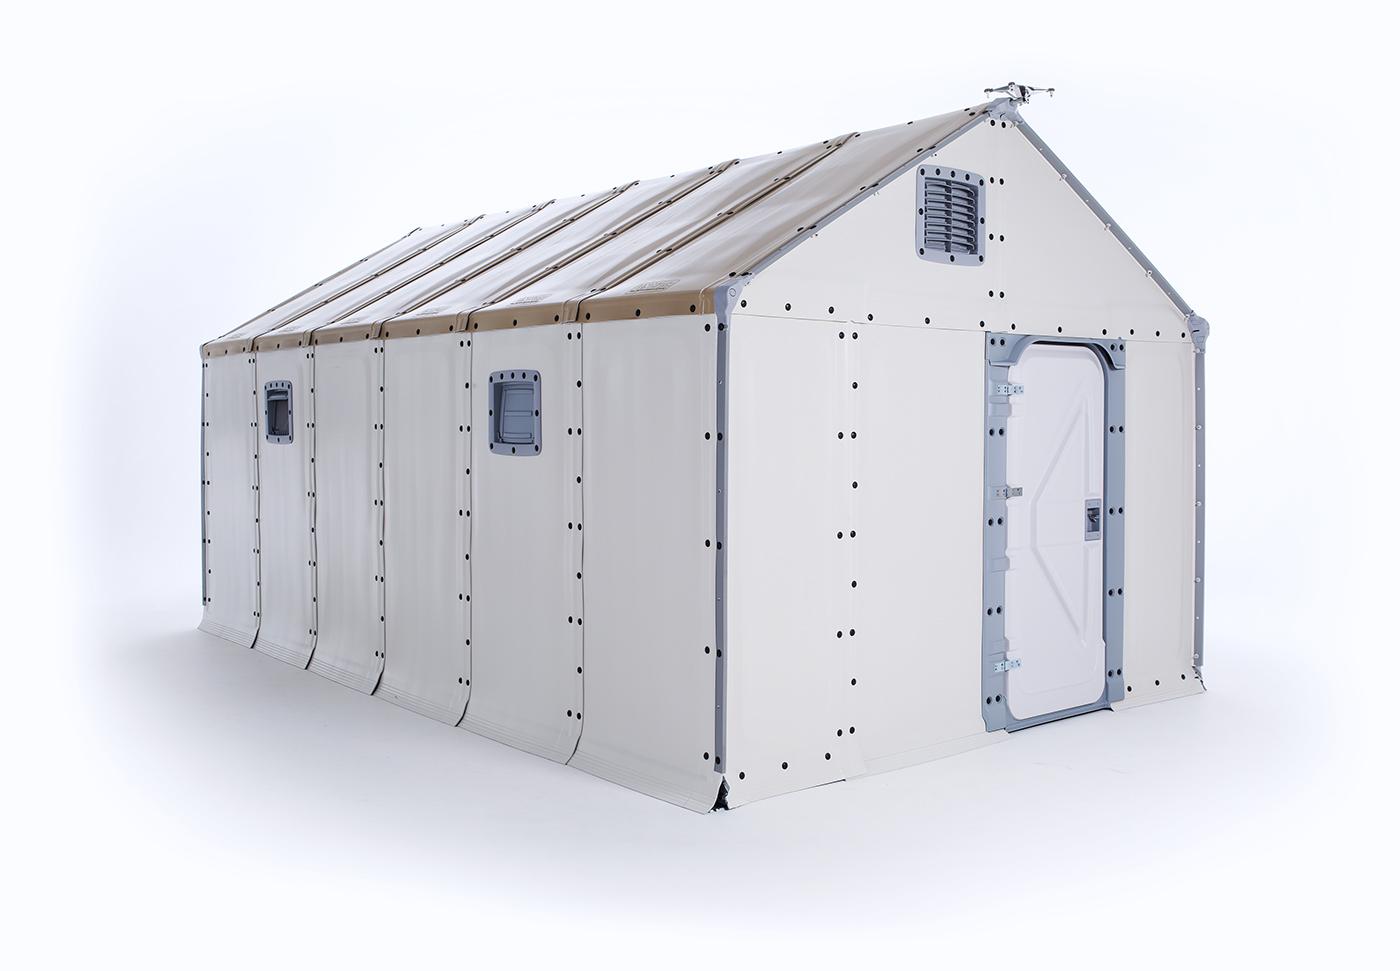 Better Shelter - Foto: © Jonas Nyström